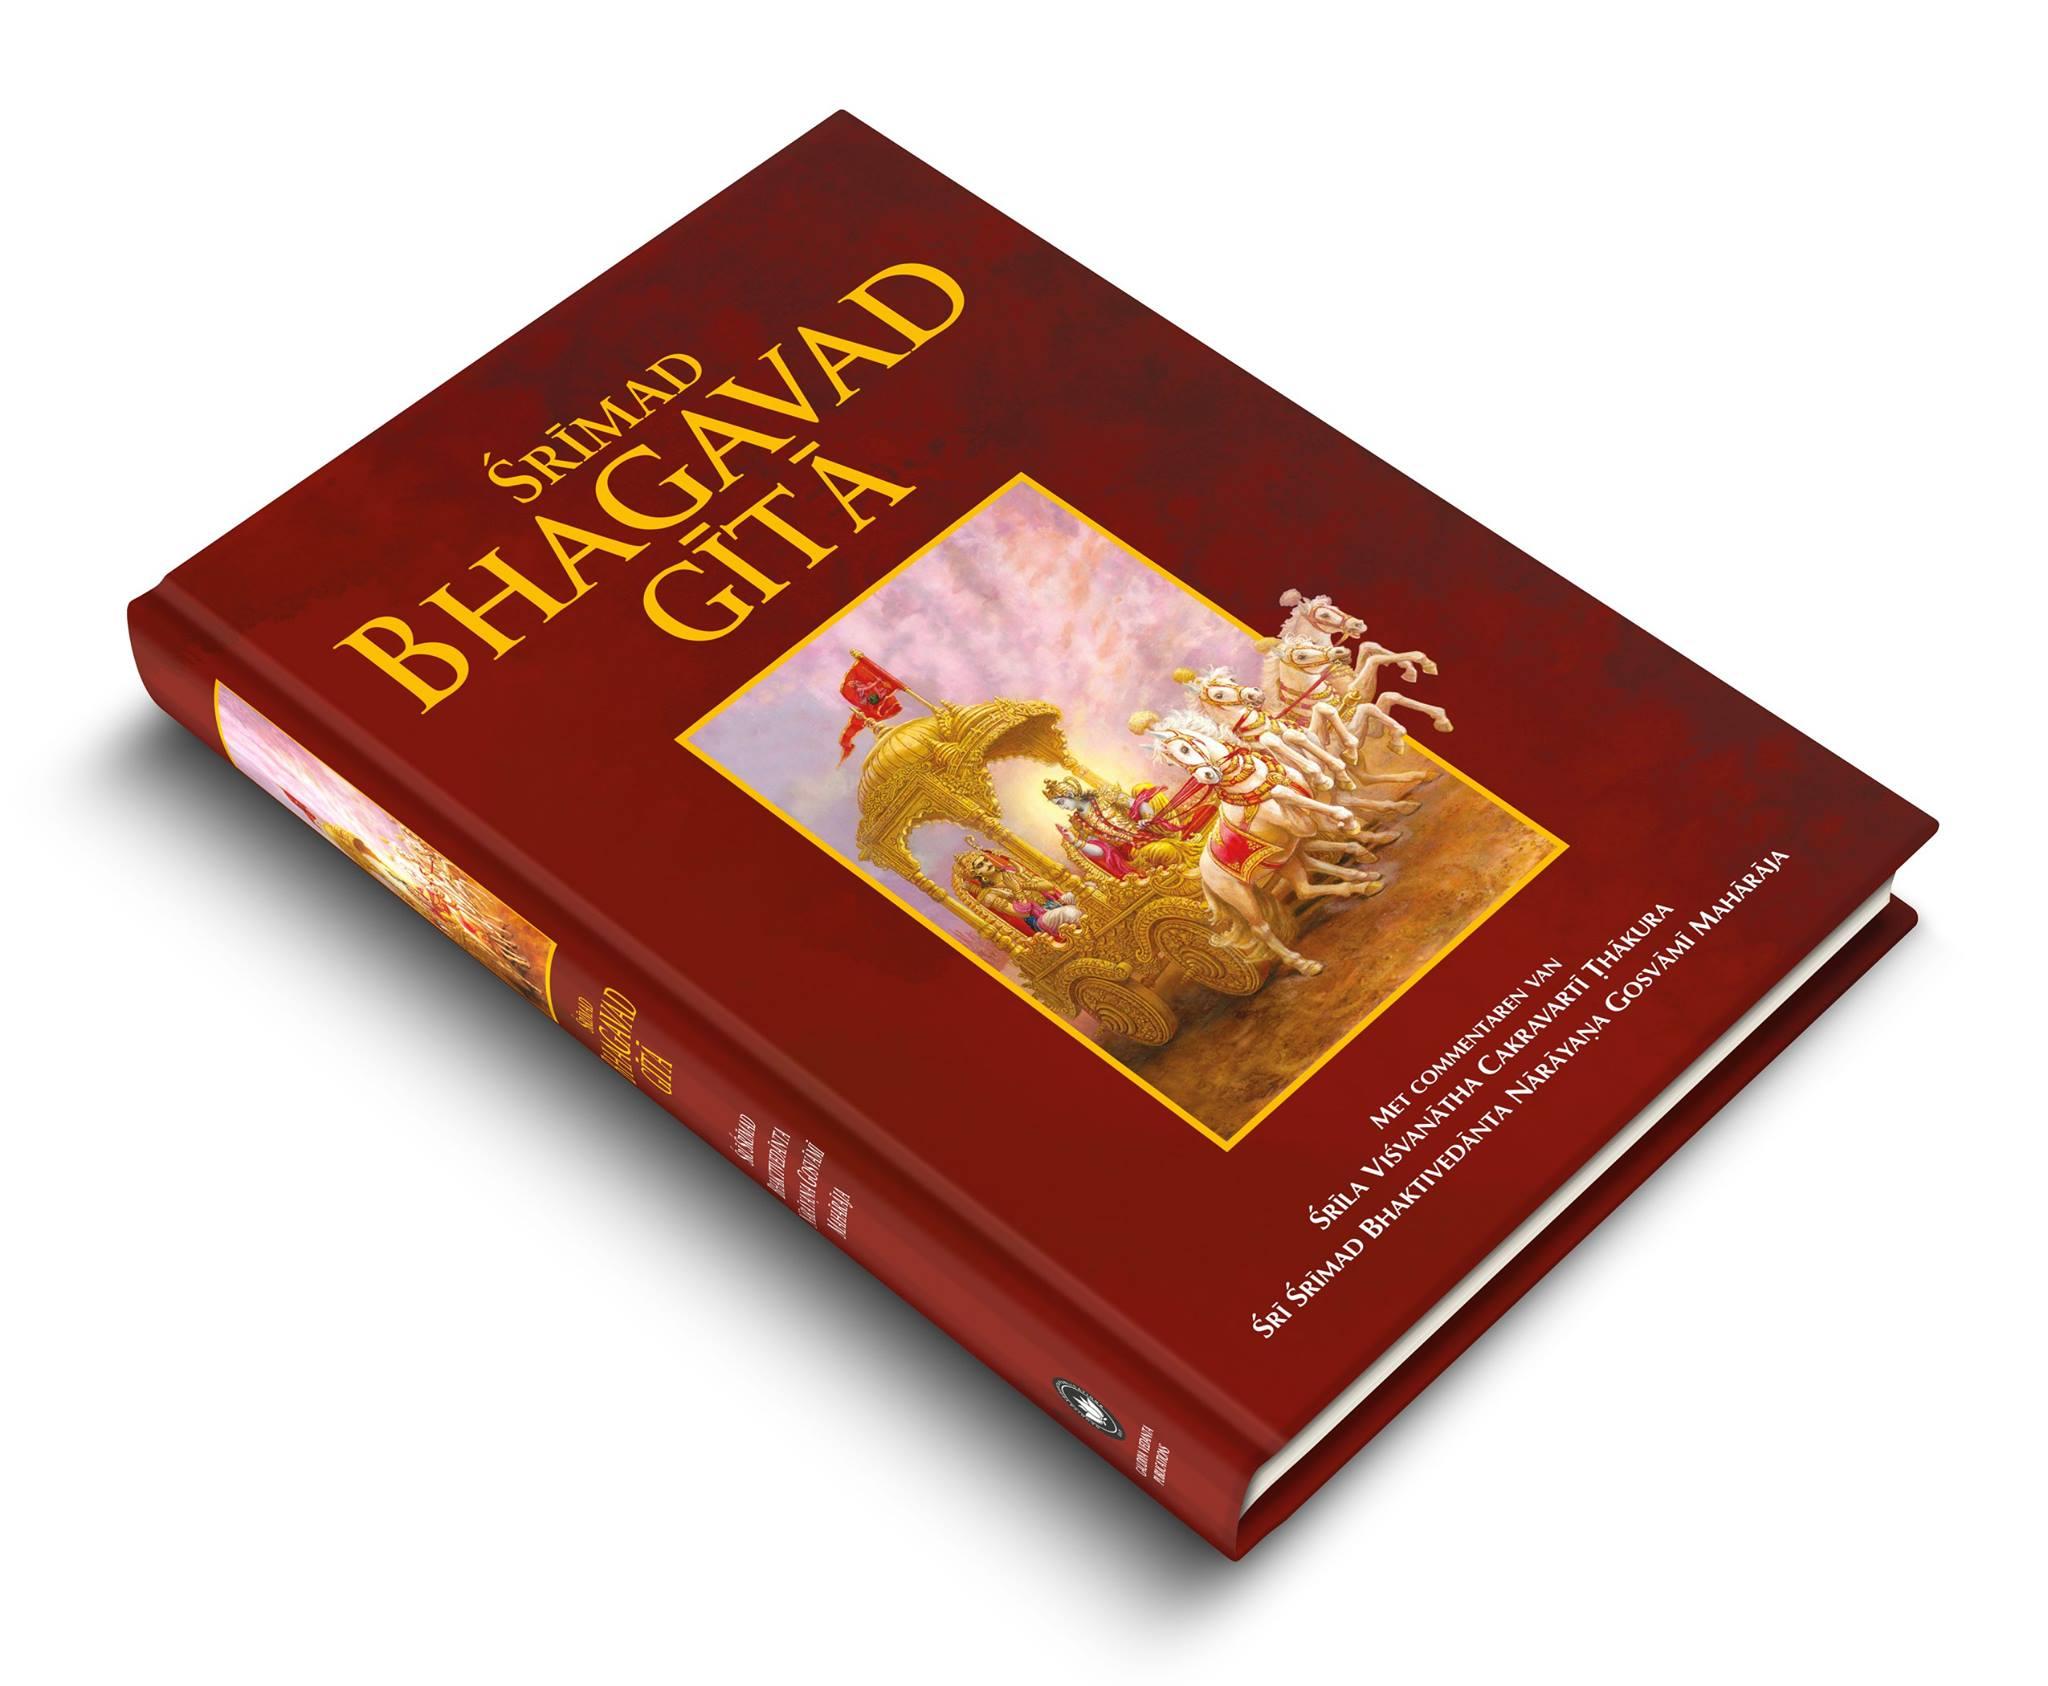 Citaten Uit Bhagavad Gita : Publicatie event bhagavad gita